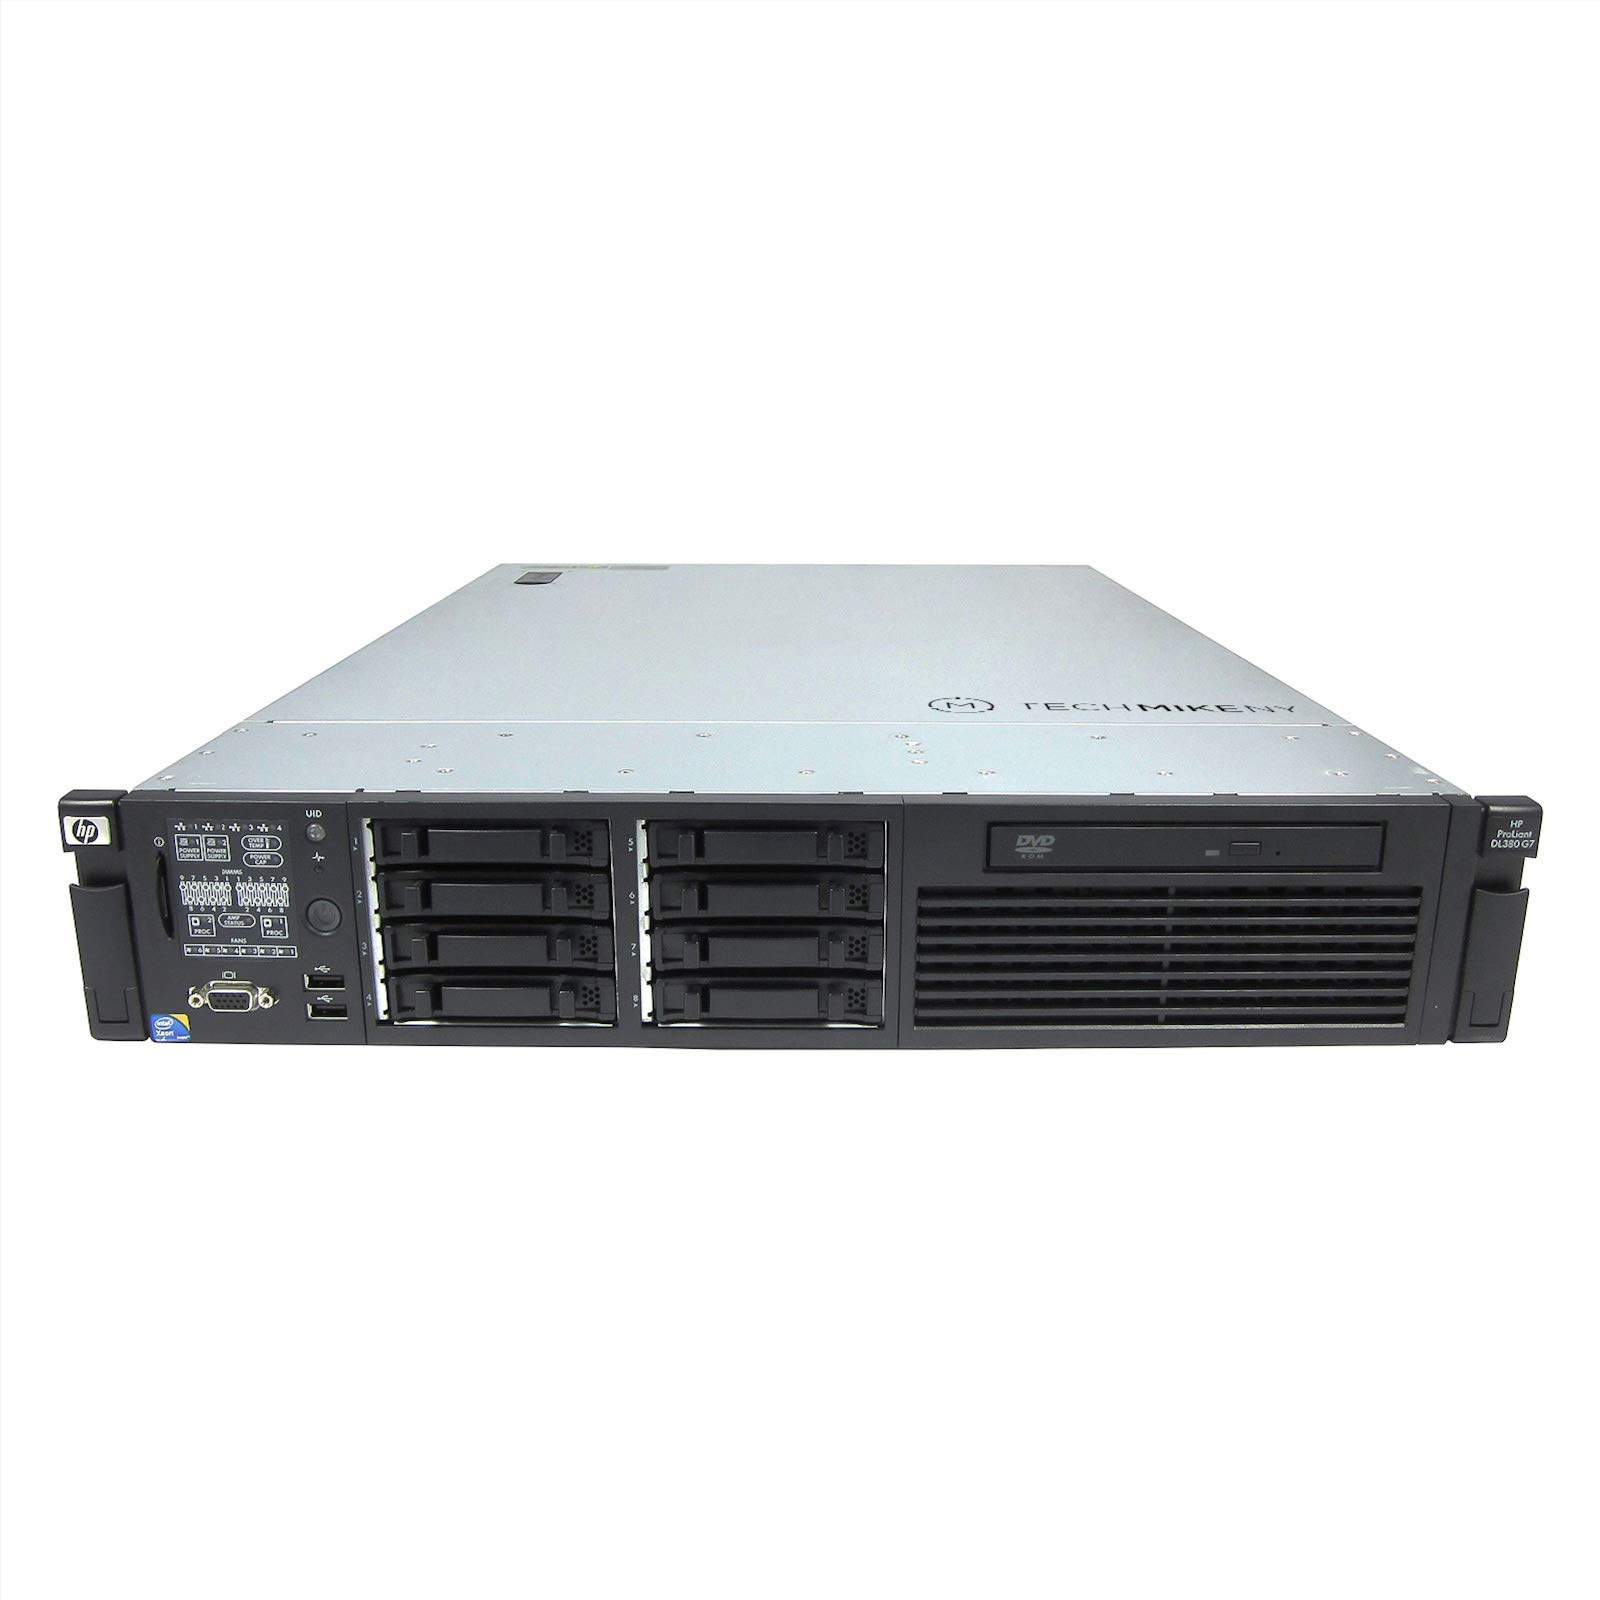 High-End HP ProLiant DL380 G7 Server 2X 3.06Ghz X5675 6C 8GB (Renewed) by HP (Image #2)